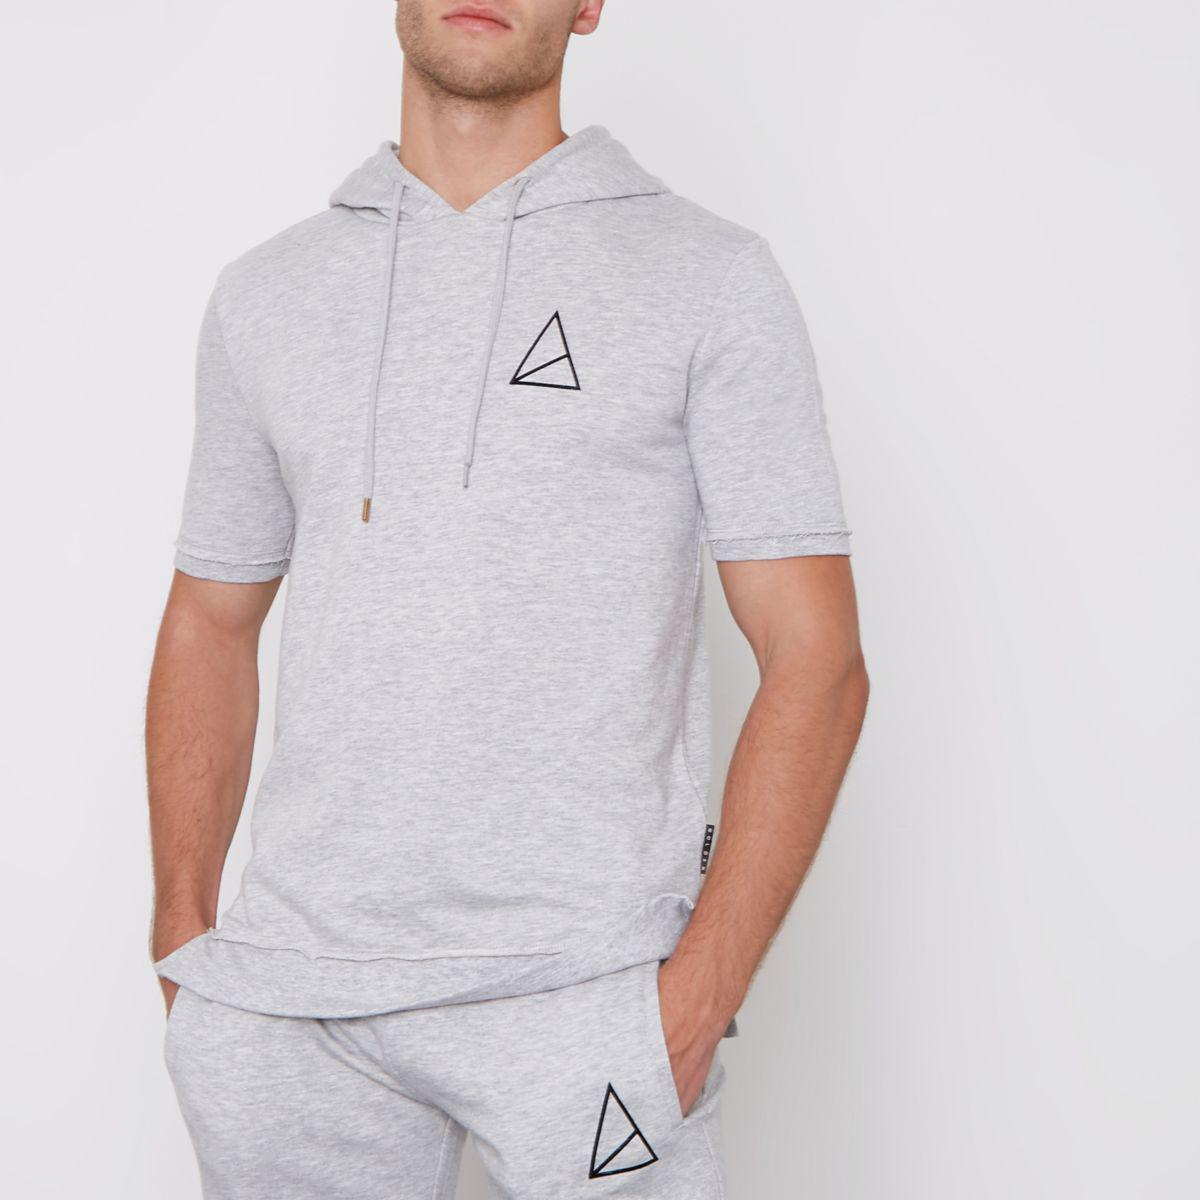 Camiseta River de corta blanca de para hombre Equation Island River manga  wrqqdAExY a5b5e292b625b